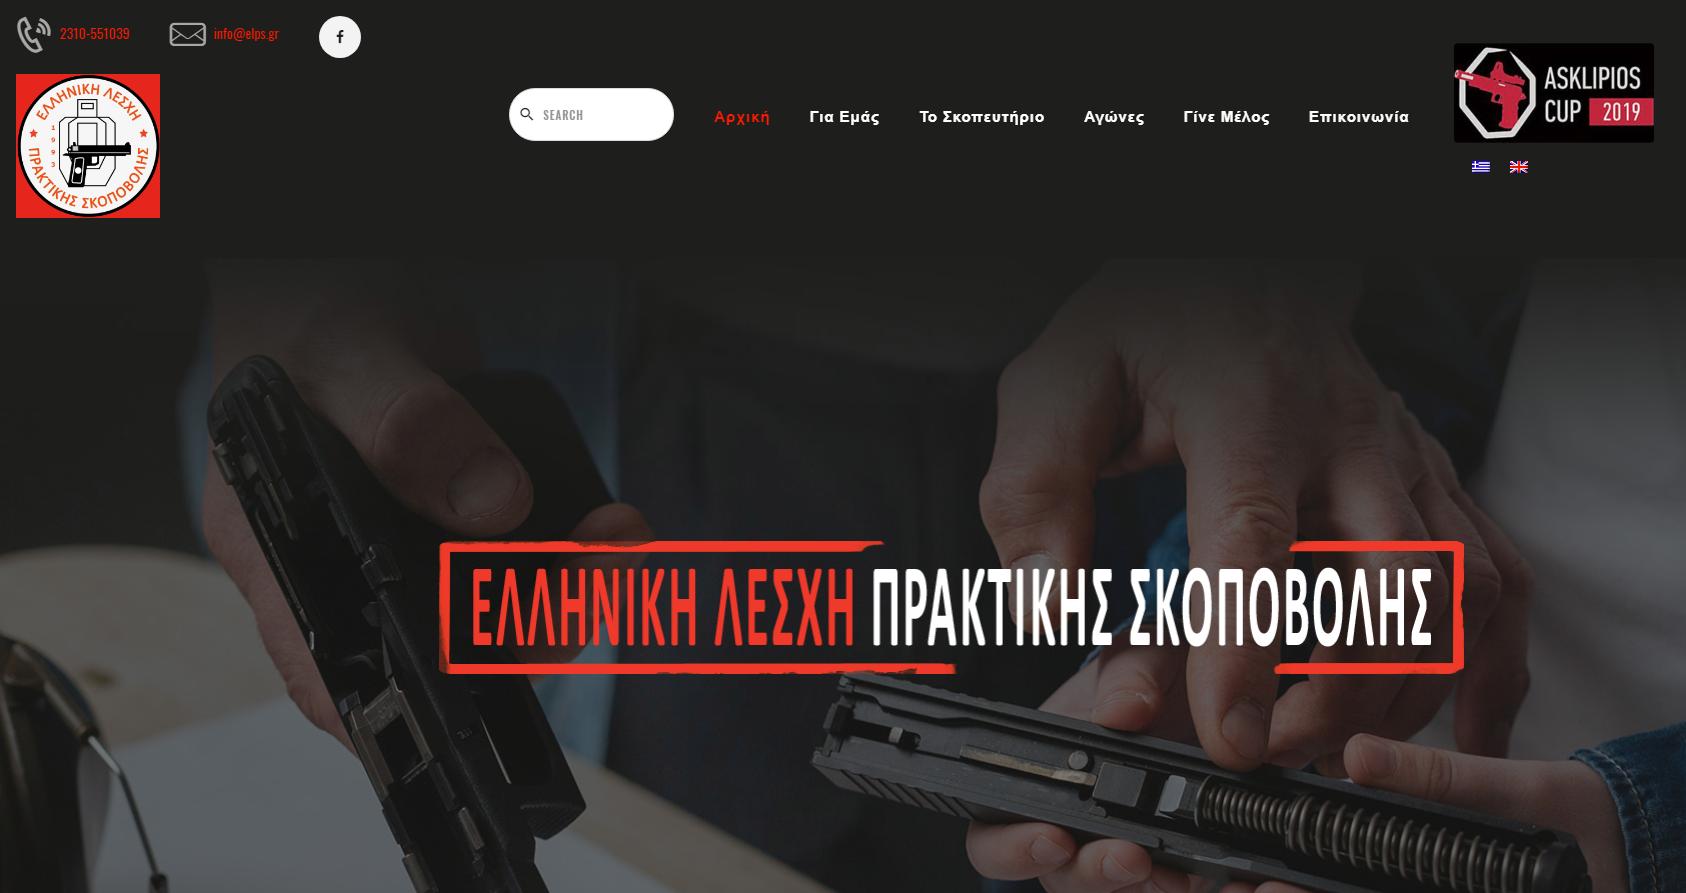 elps.gr – Νέα Ιστοσελίδα για την Ελληνική Λέσχη Πρακτικής Σκοποβολής από τη VisionCA